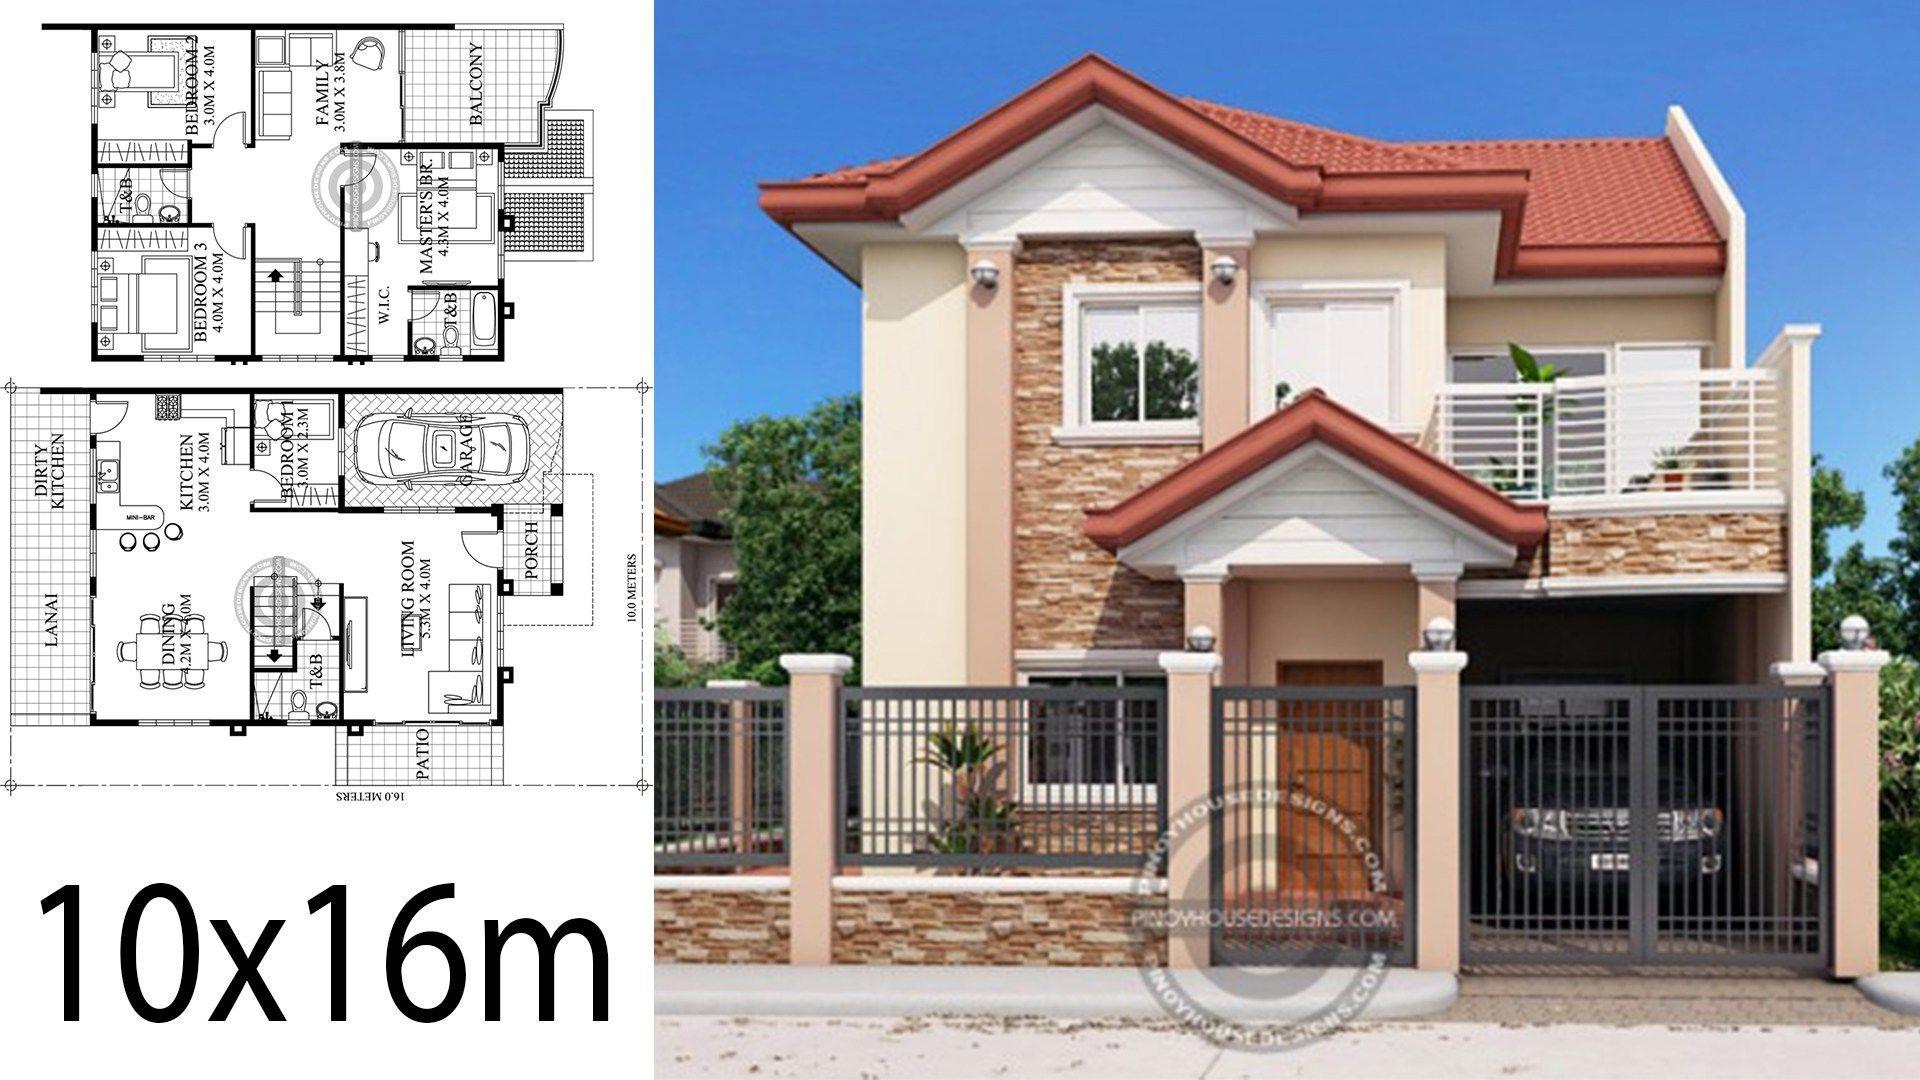 Home Design 10x16m 4 Bedrooms House Description One Car Parking And Gardenground Level Liv Philippines House Design 2 Storey House Design Home Building Design